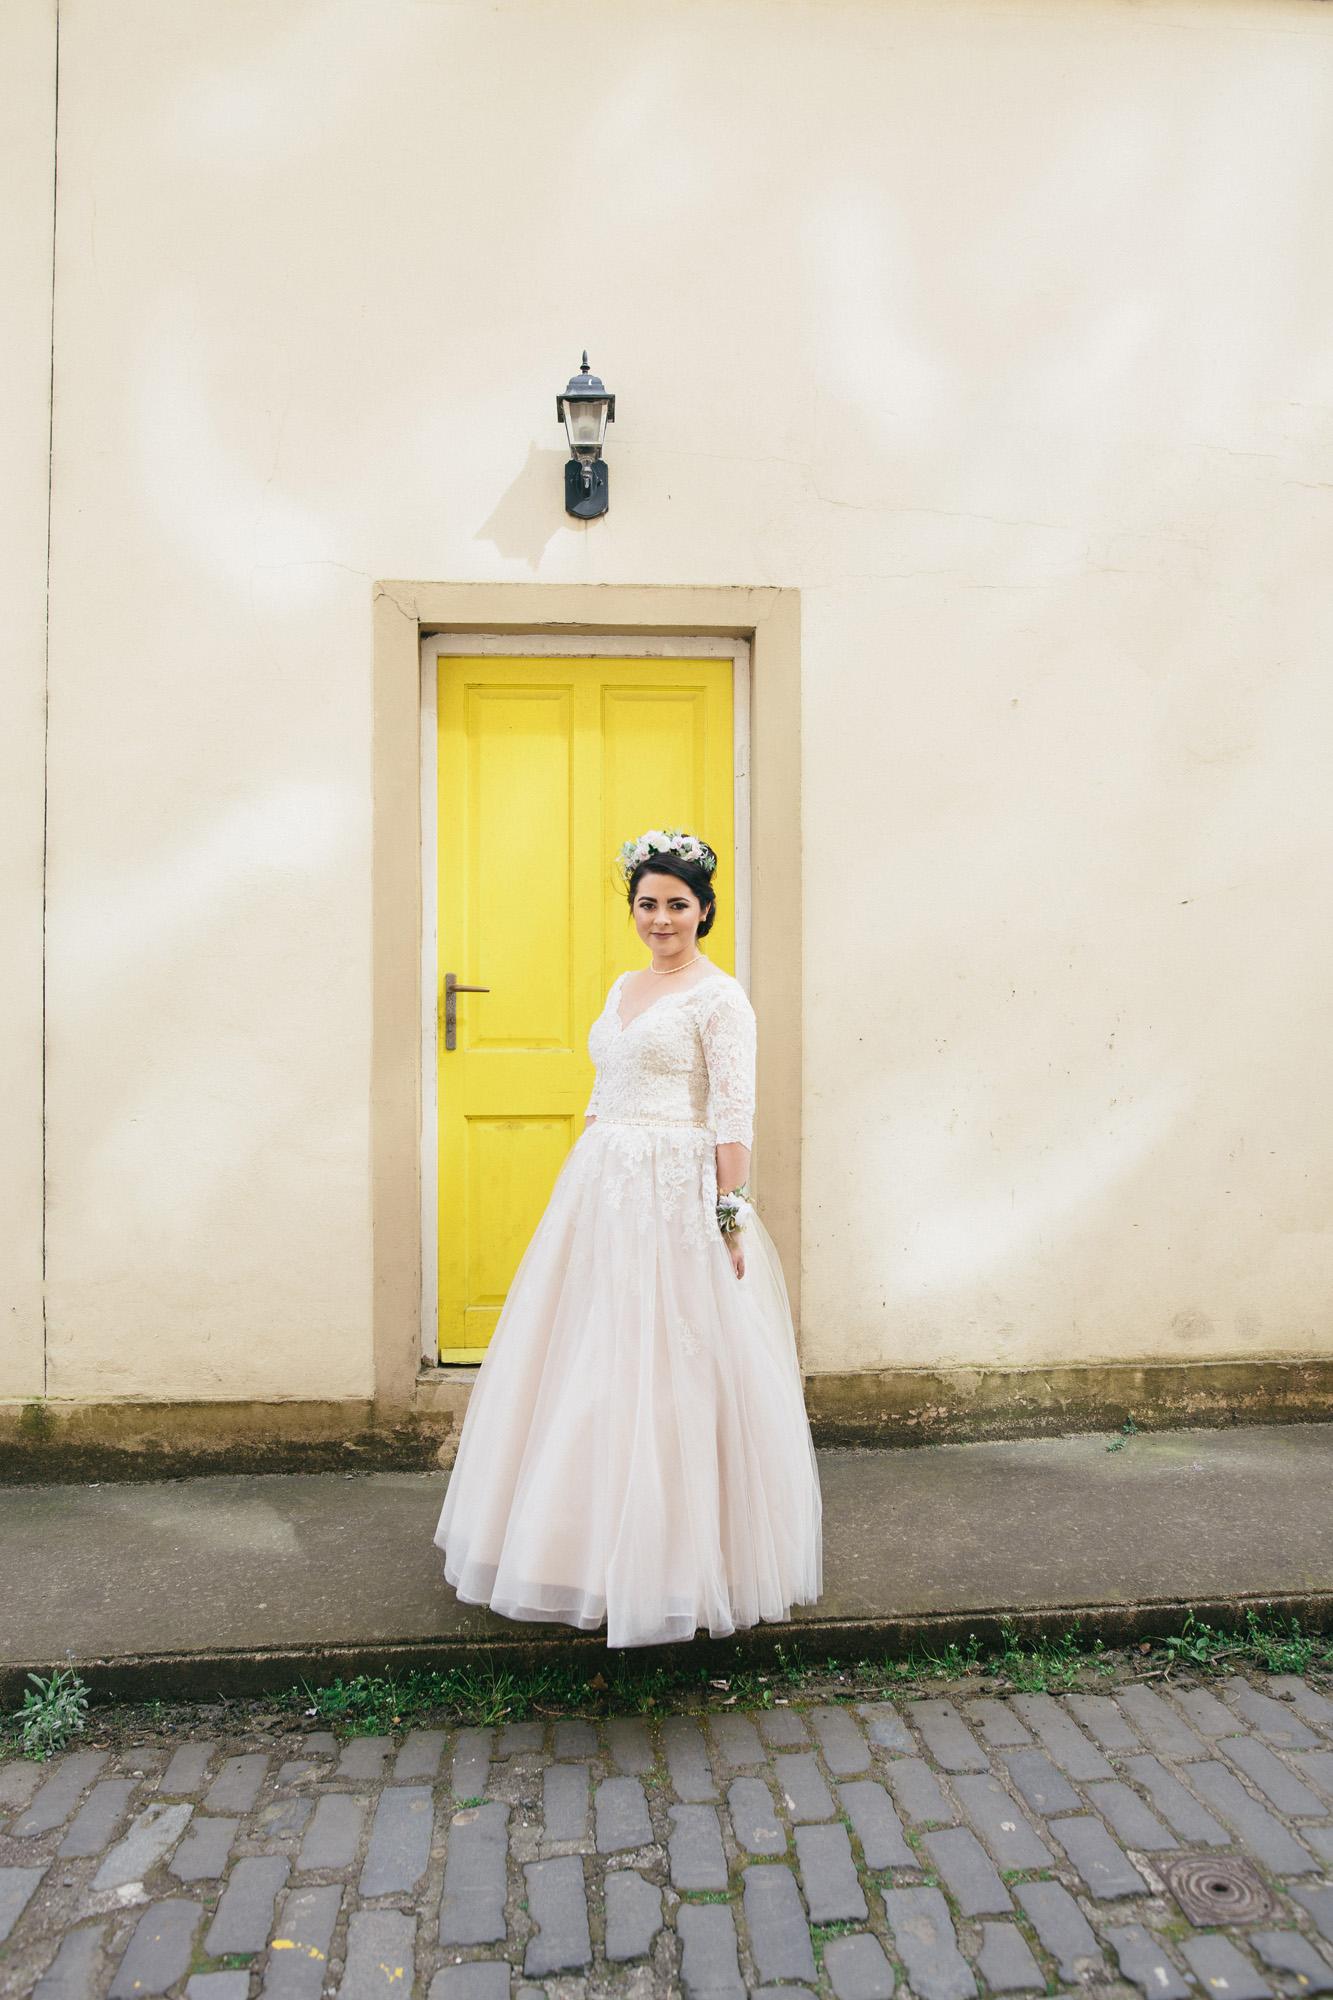 Quirky Wedding Photography Glasgow West End 036.jpg